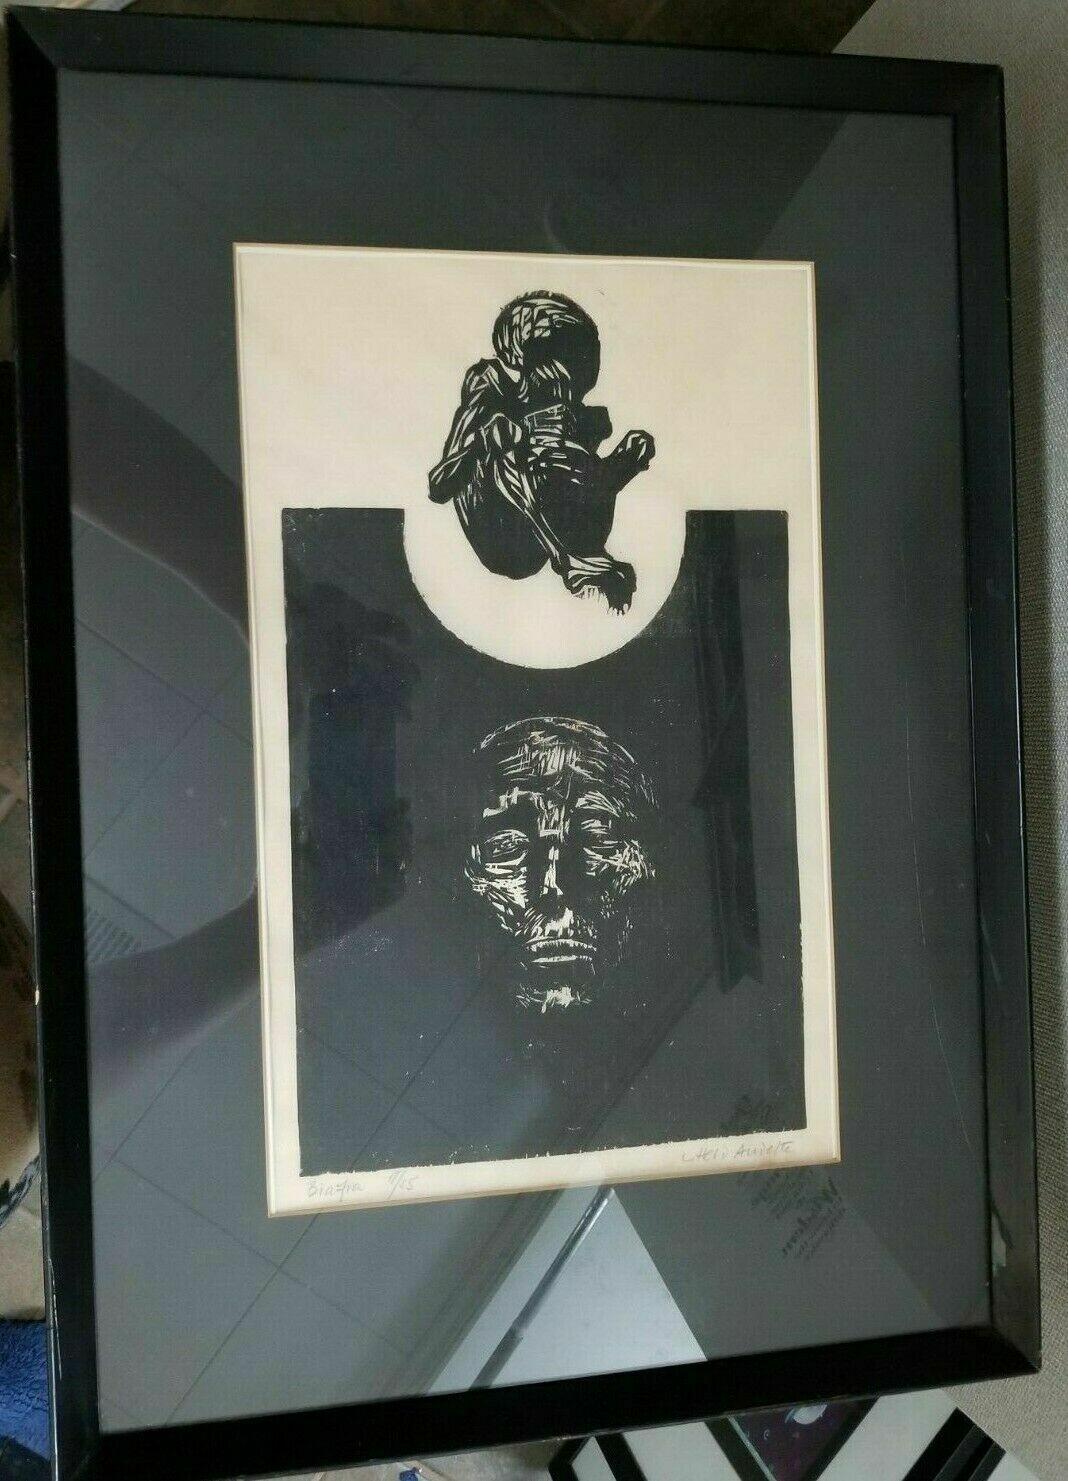 "Biafra African Ink Art Anna Audette 18"" x 25"" Black White Baby Elderly Time Age"